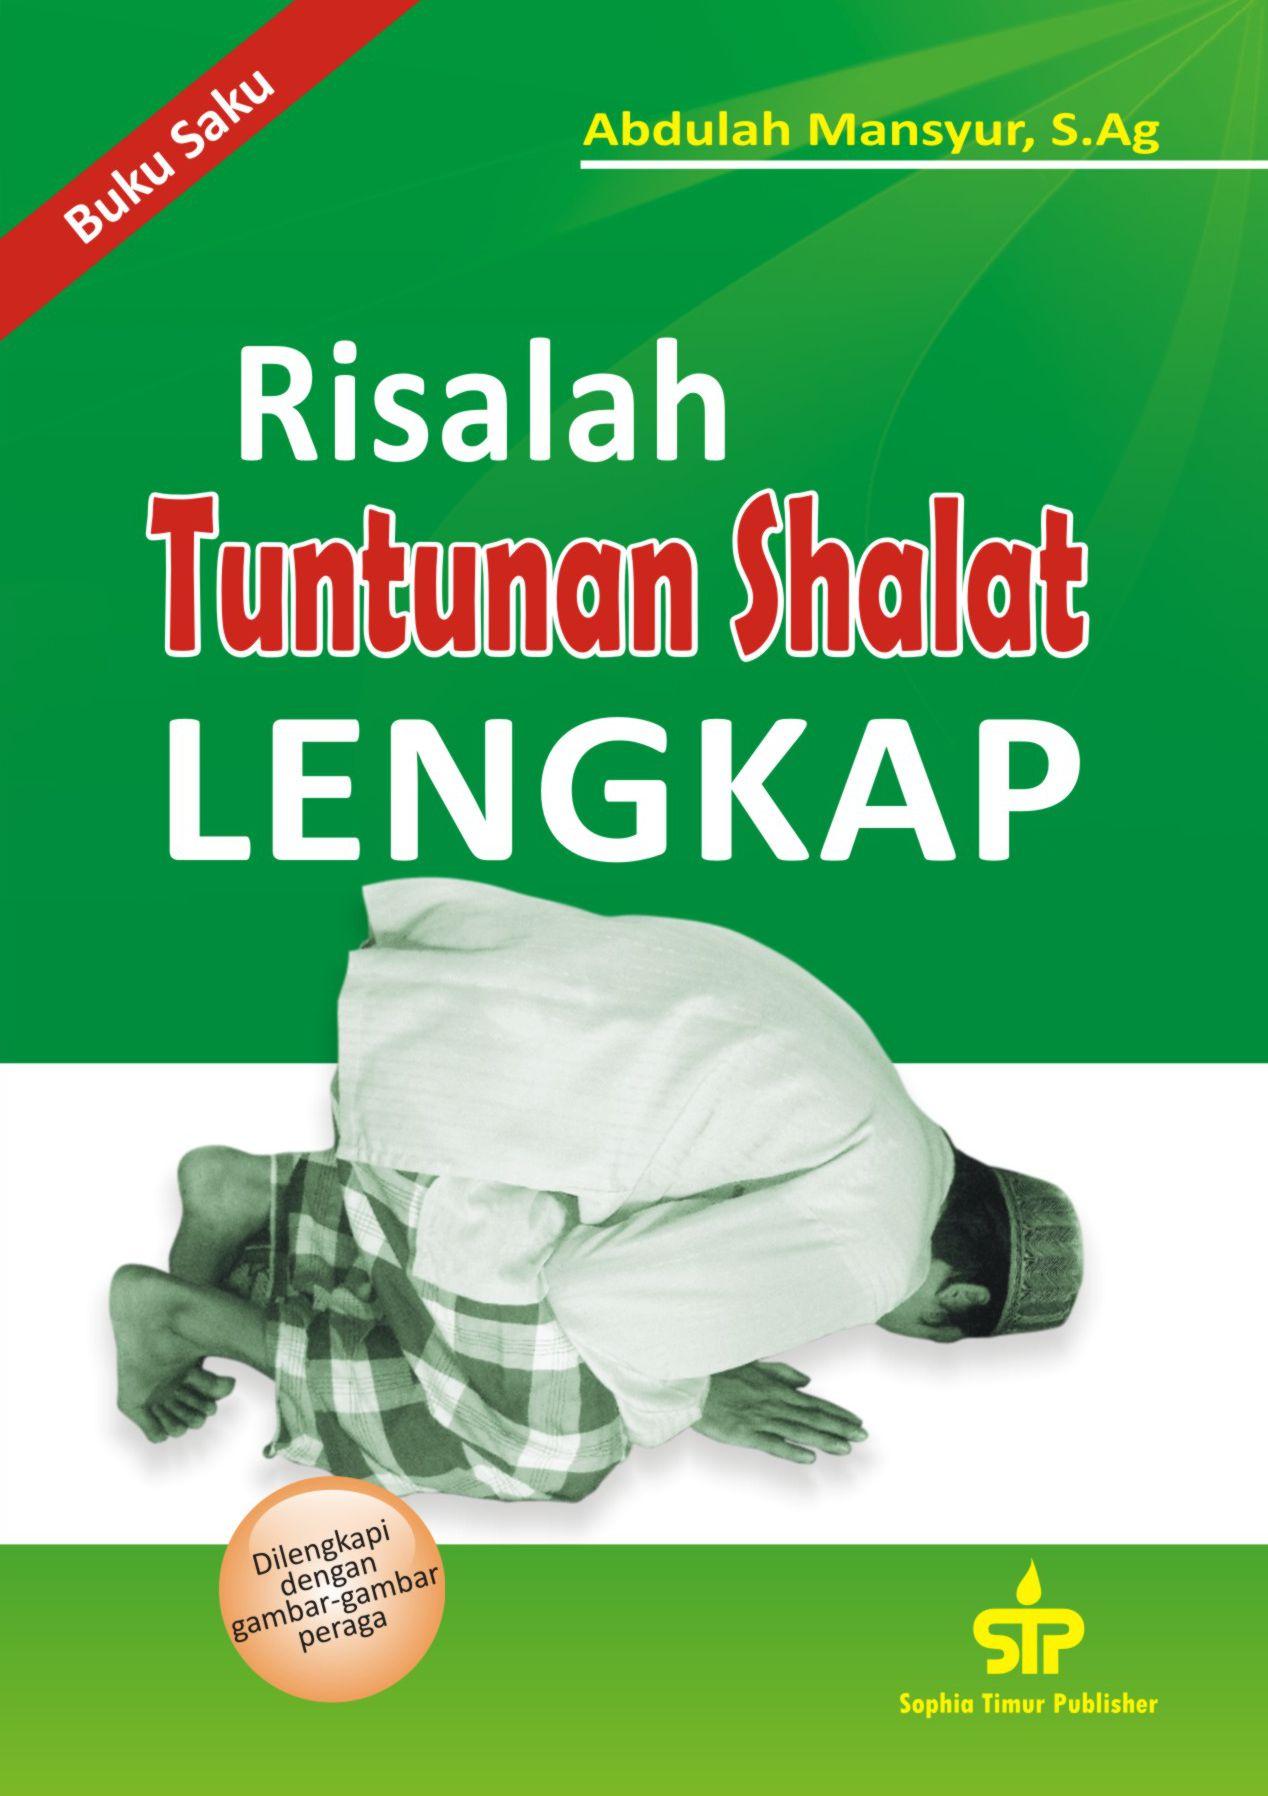 Risalah Tuntunan Shalat LENGKAP - Buku Saku Tuntunan Sholat